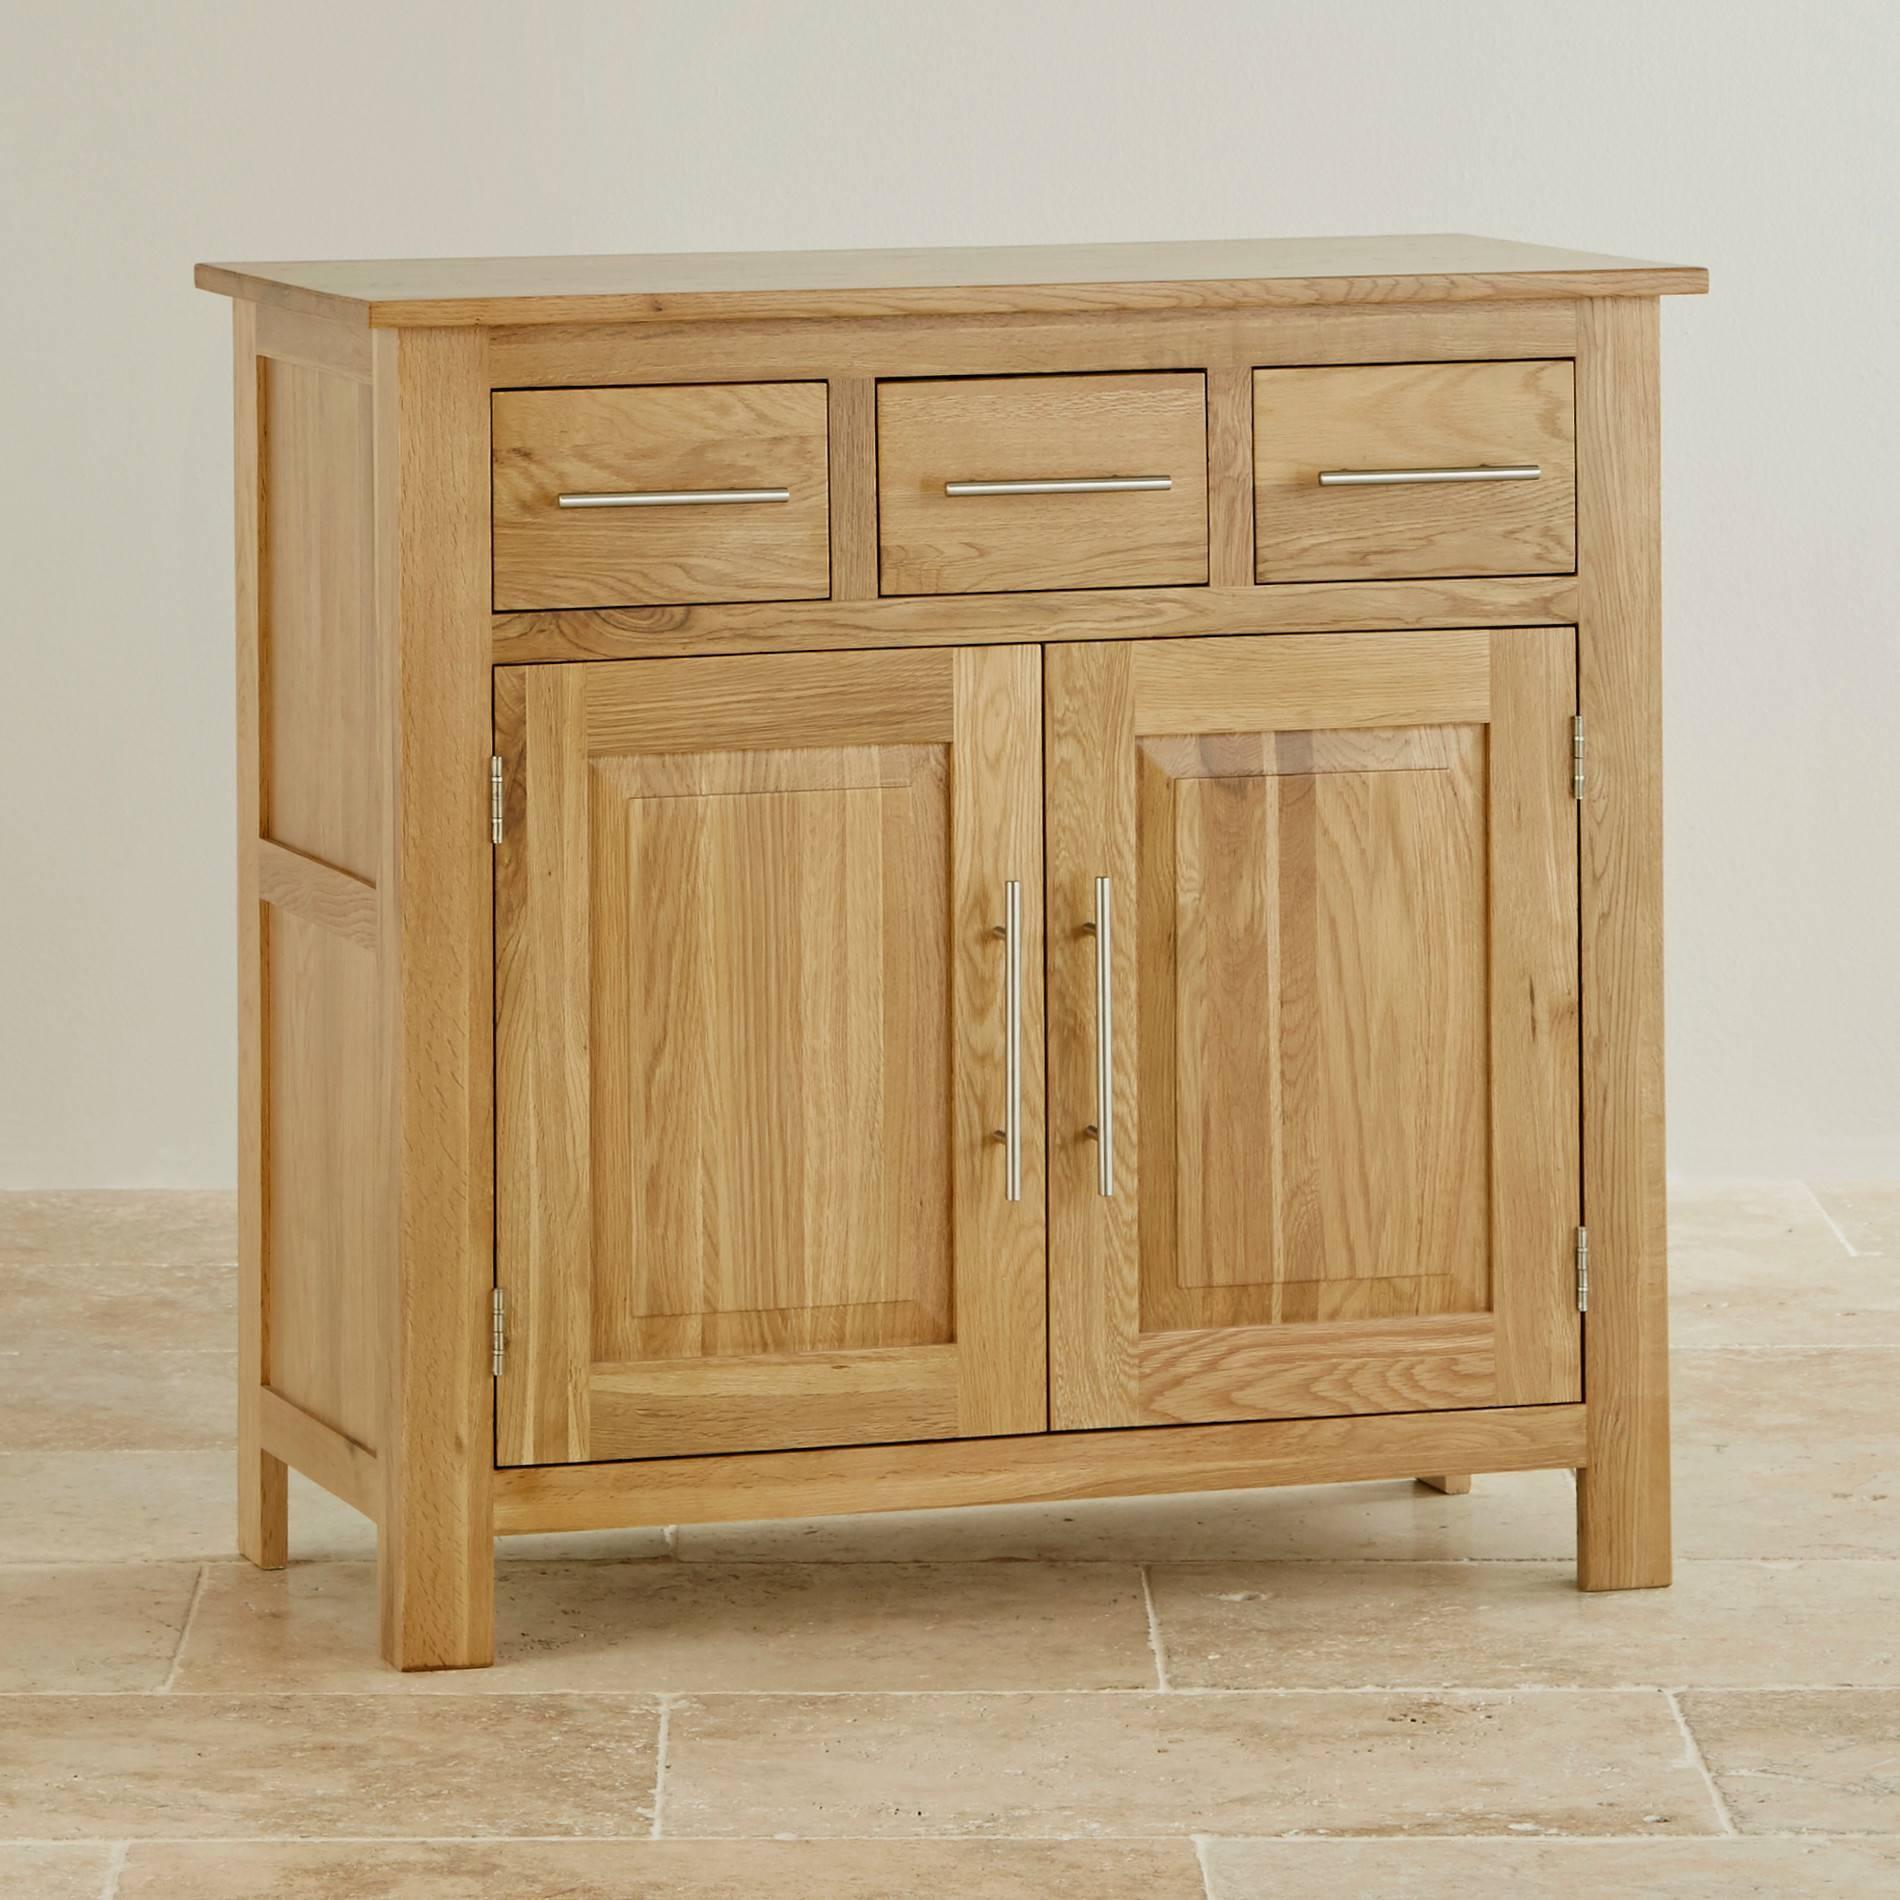 Sideboards | 100% Solid Hardwood | Oak Furniture Land With Regard To Narrow Oak Sideboard (#14 of 20)